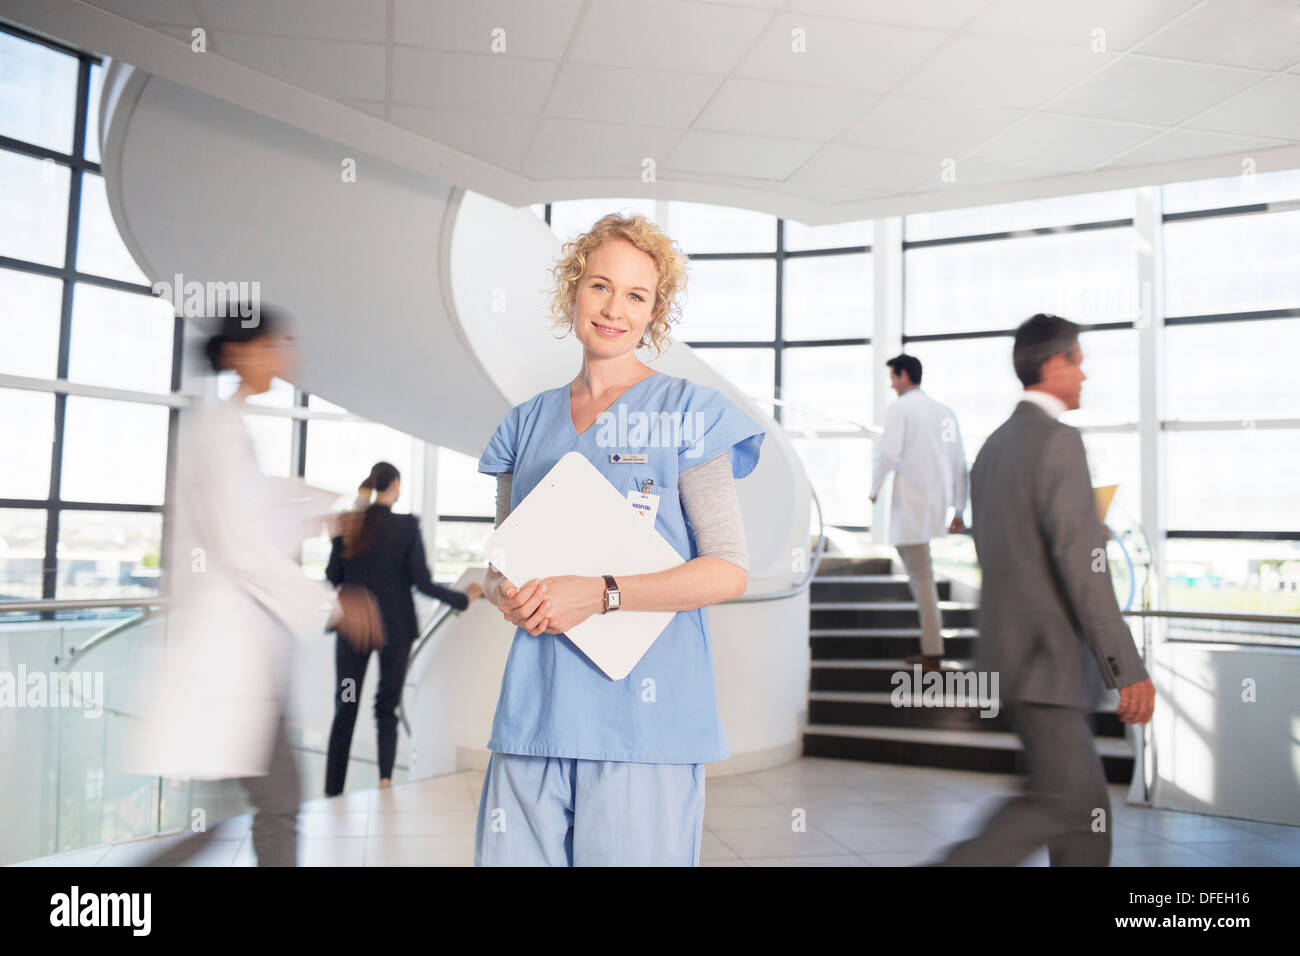 Portrait of smiling nurse in hospital - Stock Image